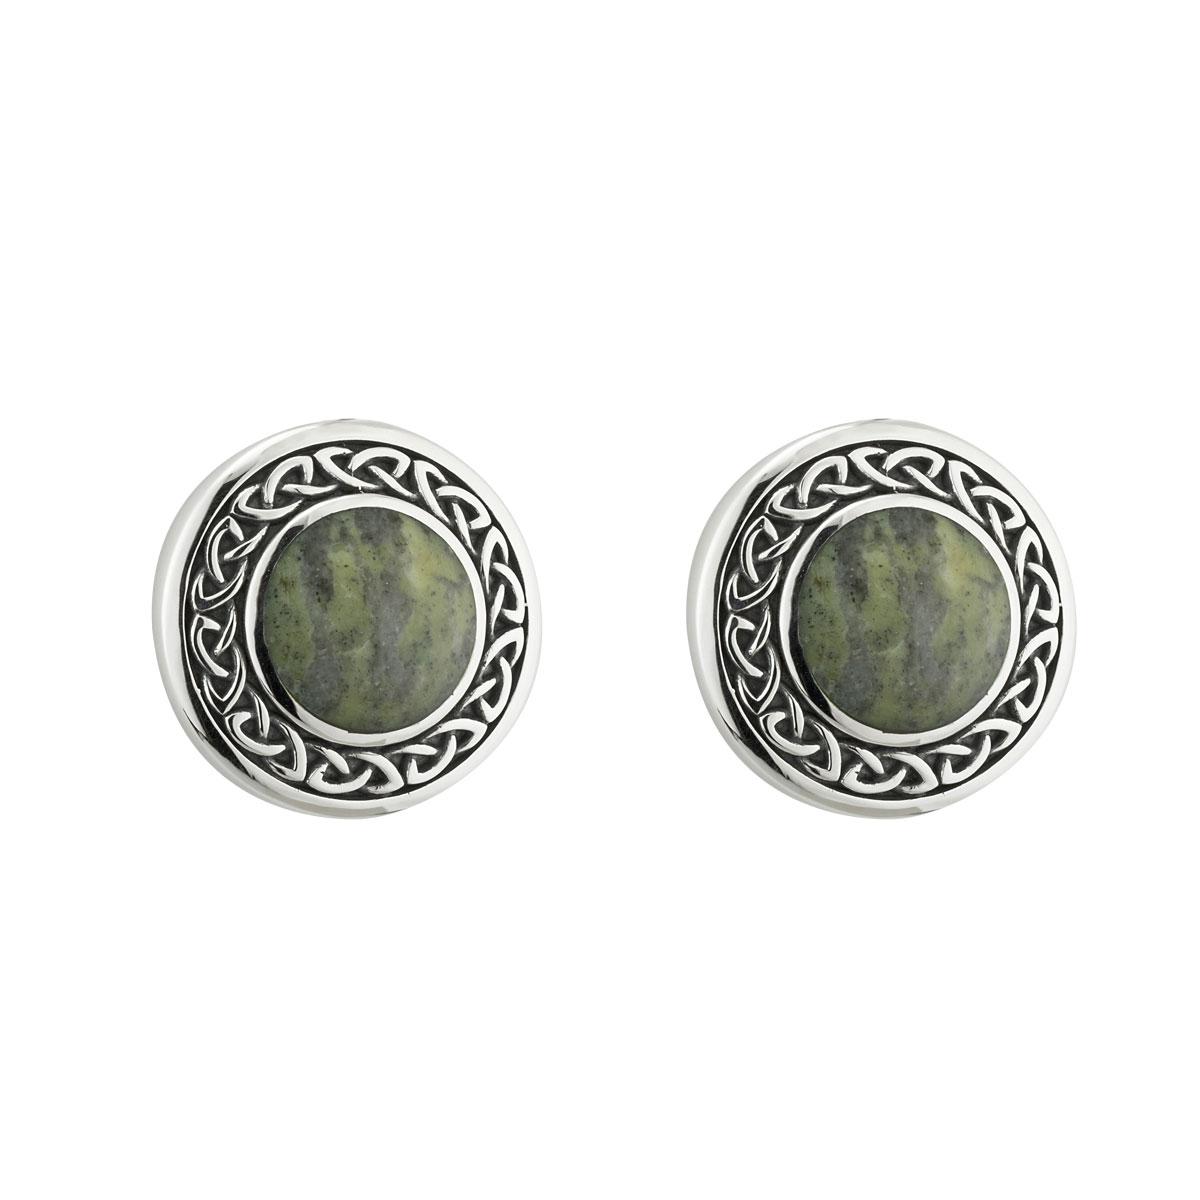 Cashs Ireland, Sterling Silver Connemara Marble Round Stud Earrings